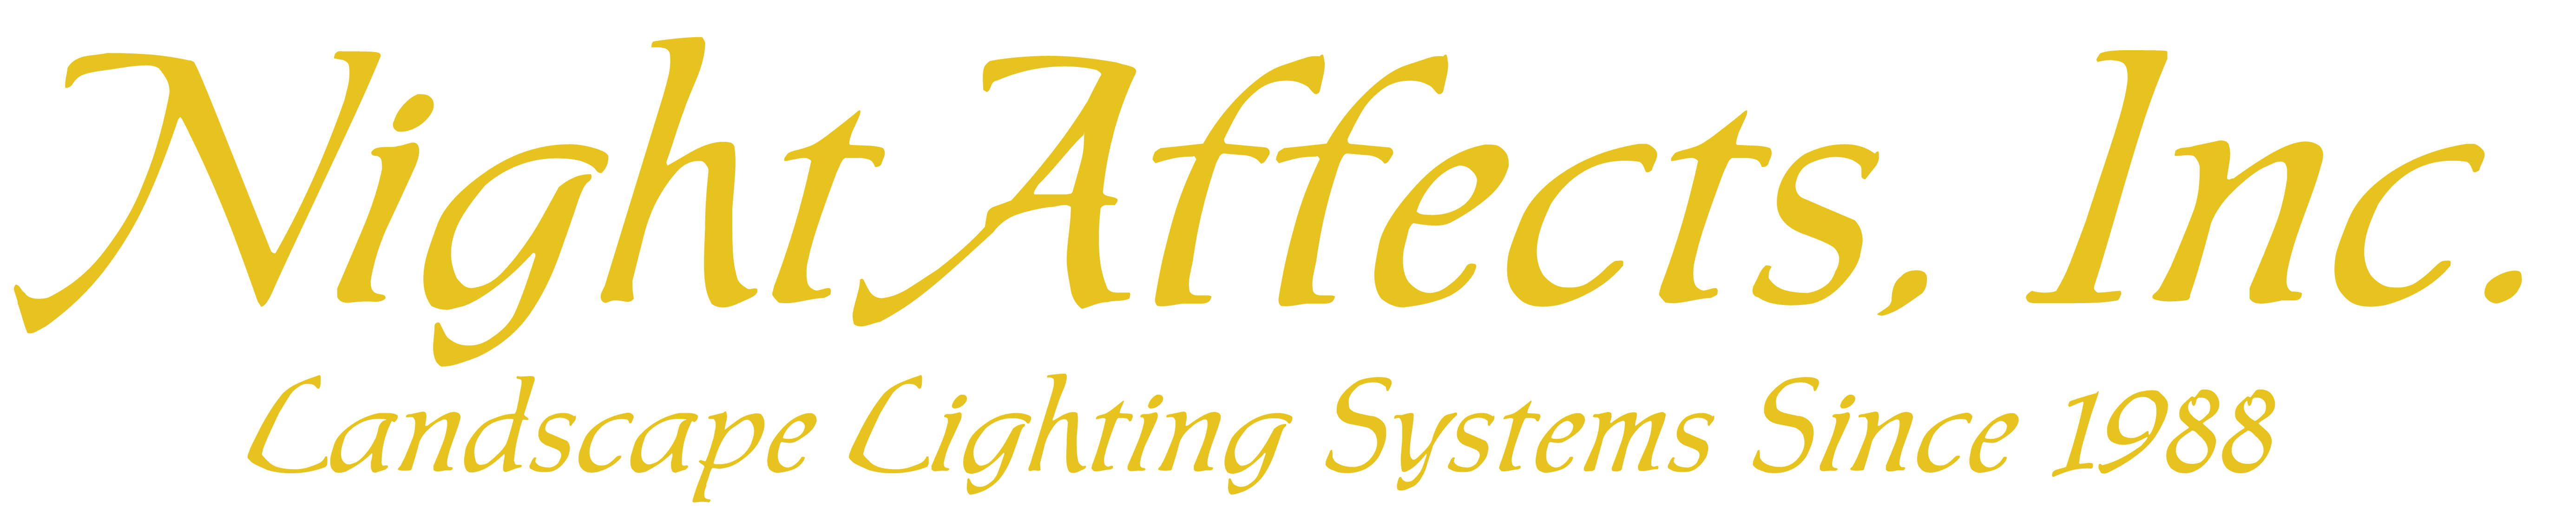 NightAffects, Inc - logo